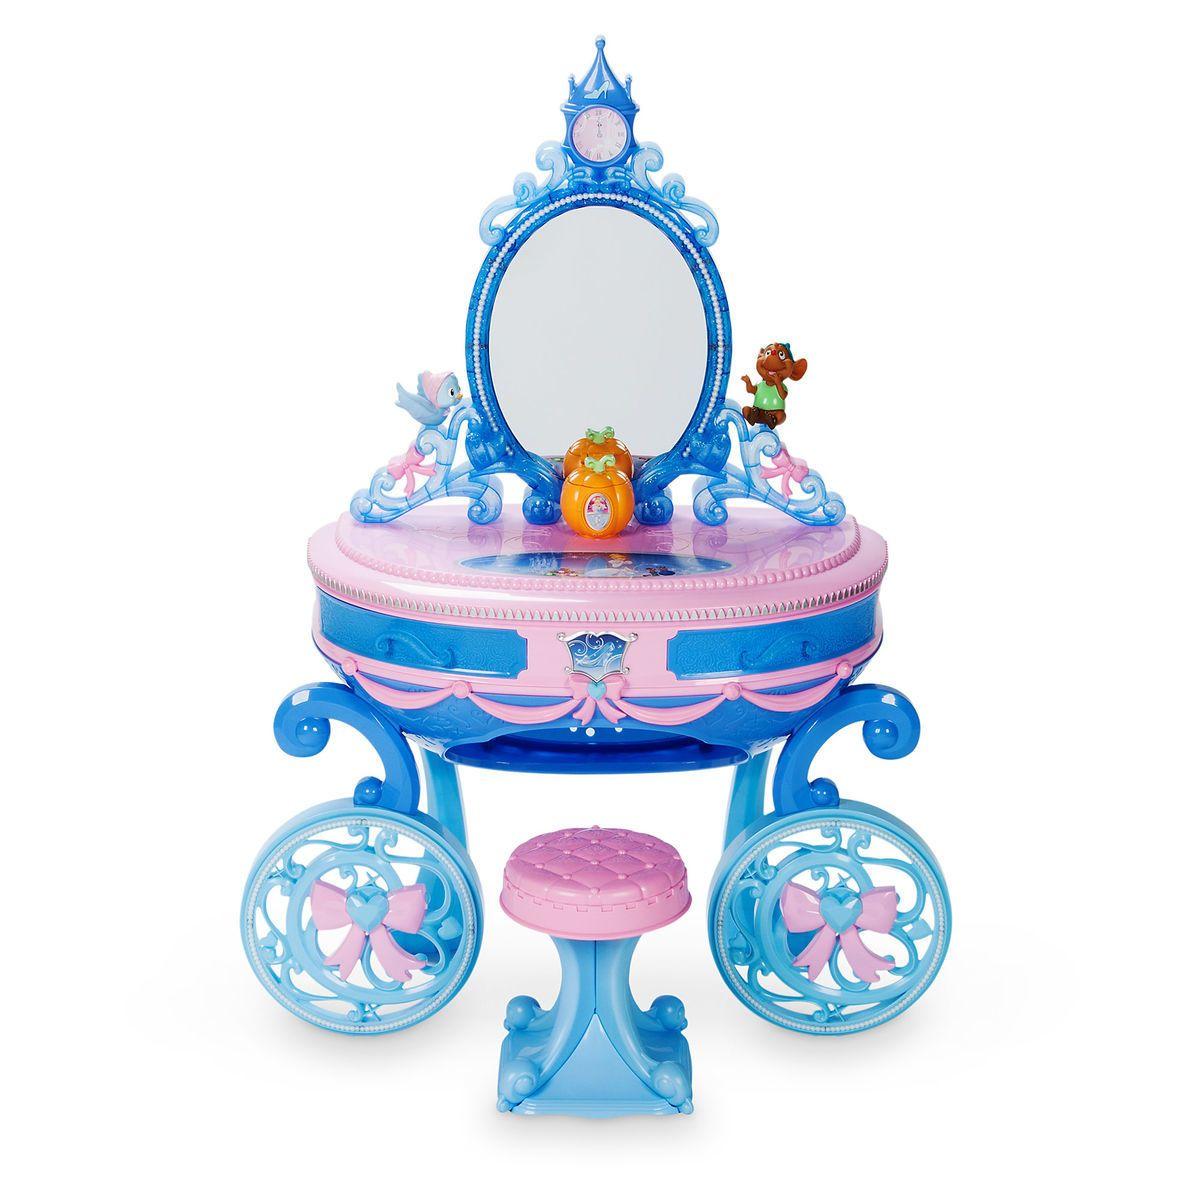 Cinderella Carriage Light Up Vanity Play Set Princess Toys Disney Princess Toys Baby Girl Toys